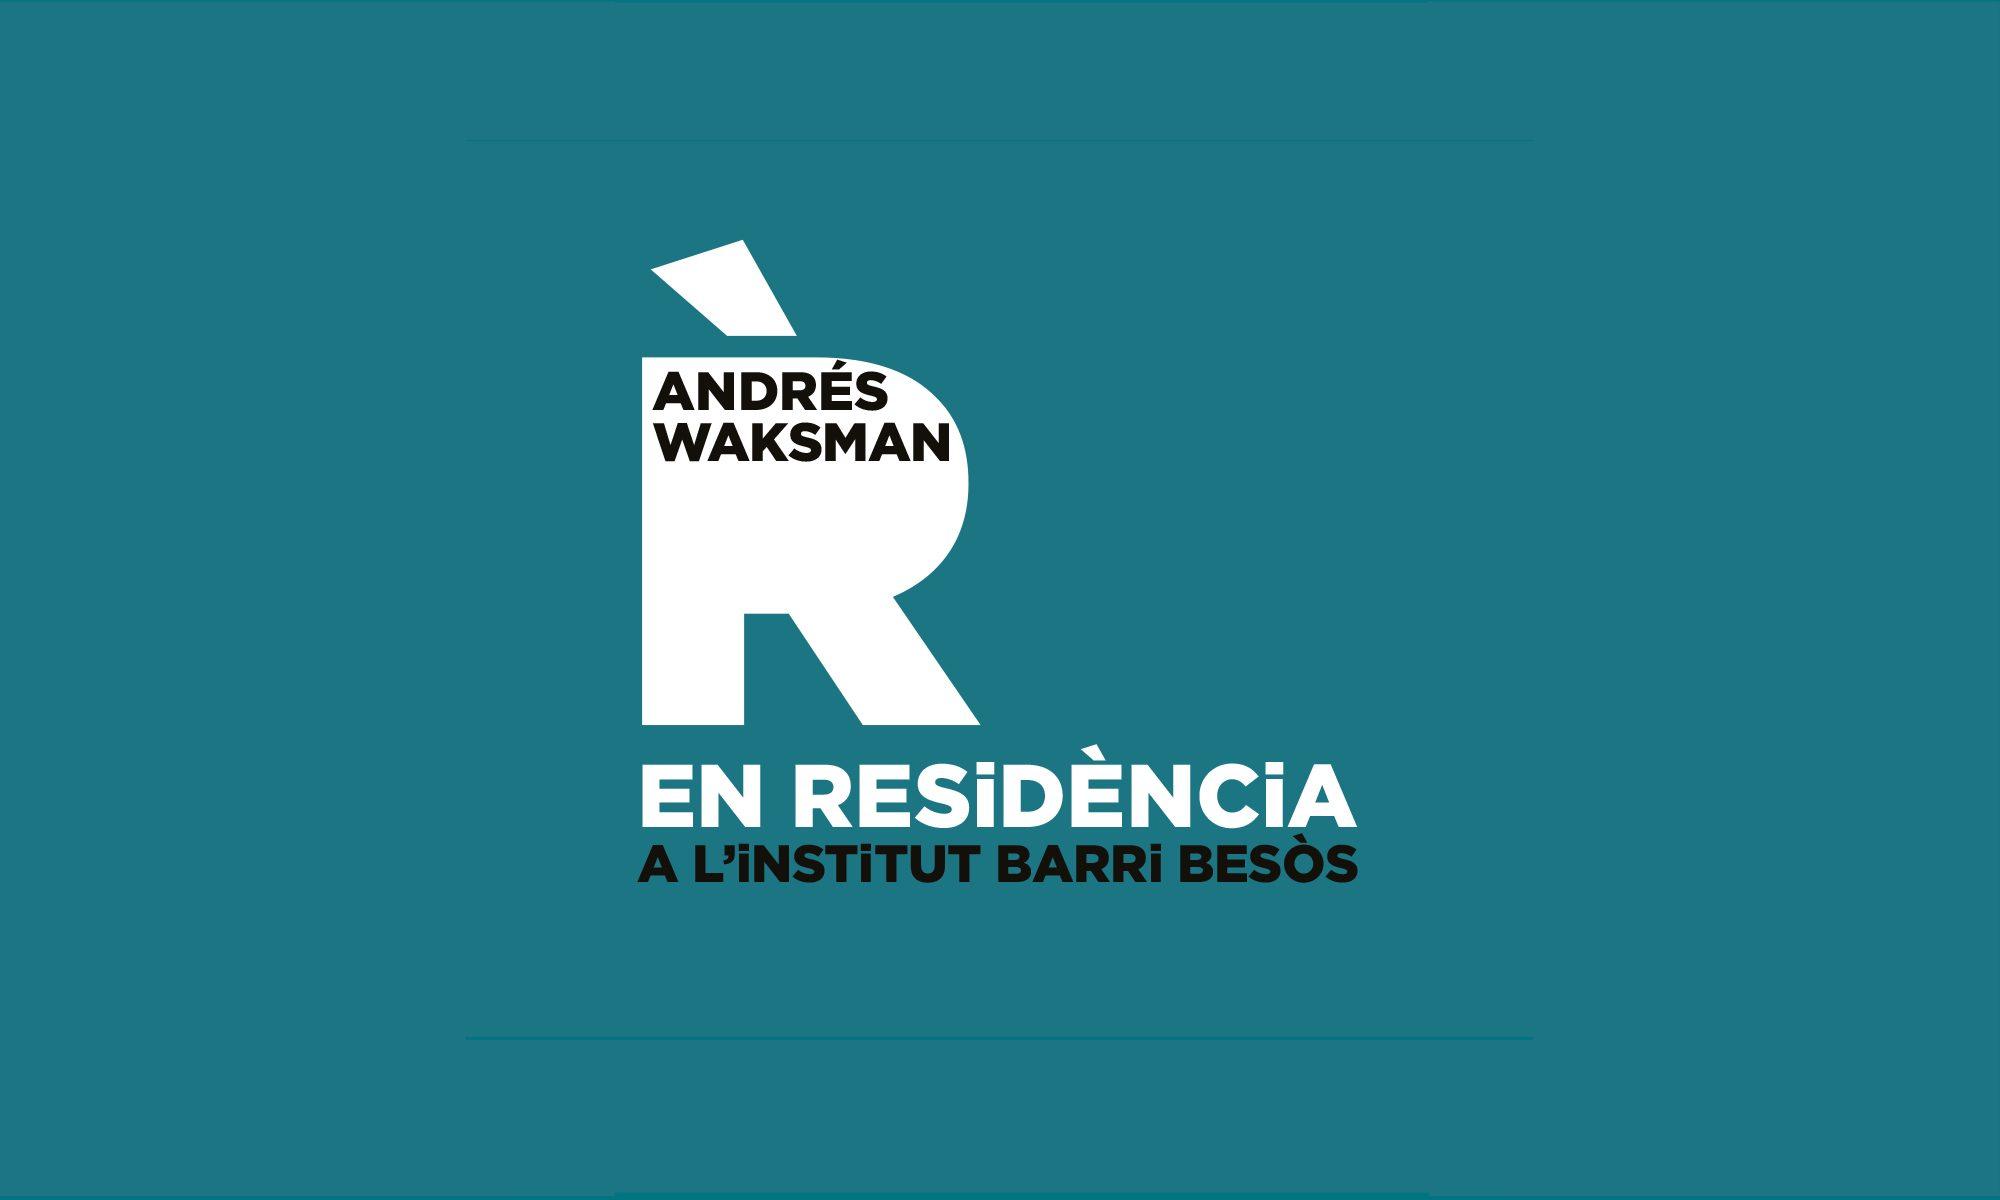 Andrés Waksman EN RESiDÈNCiA